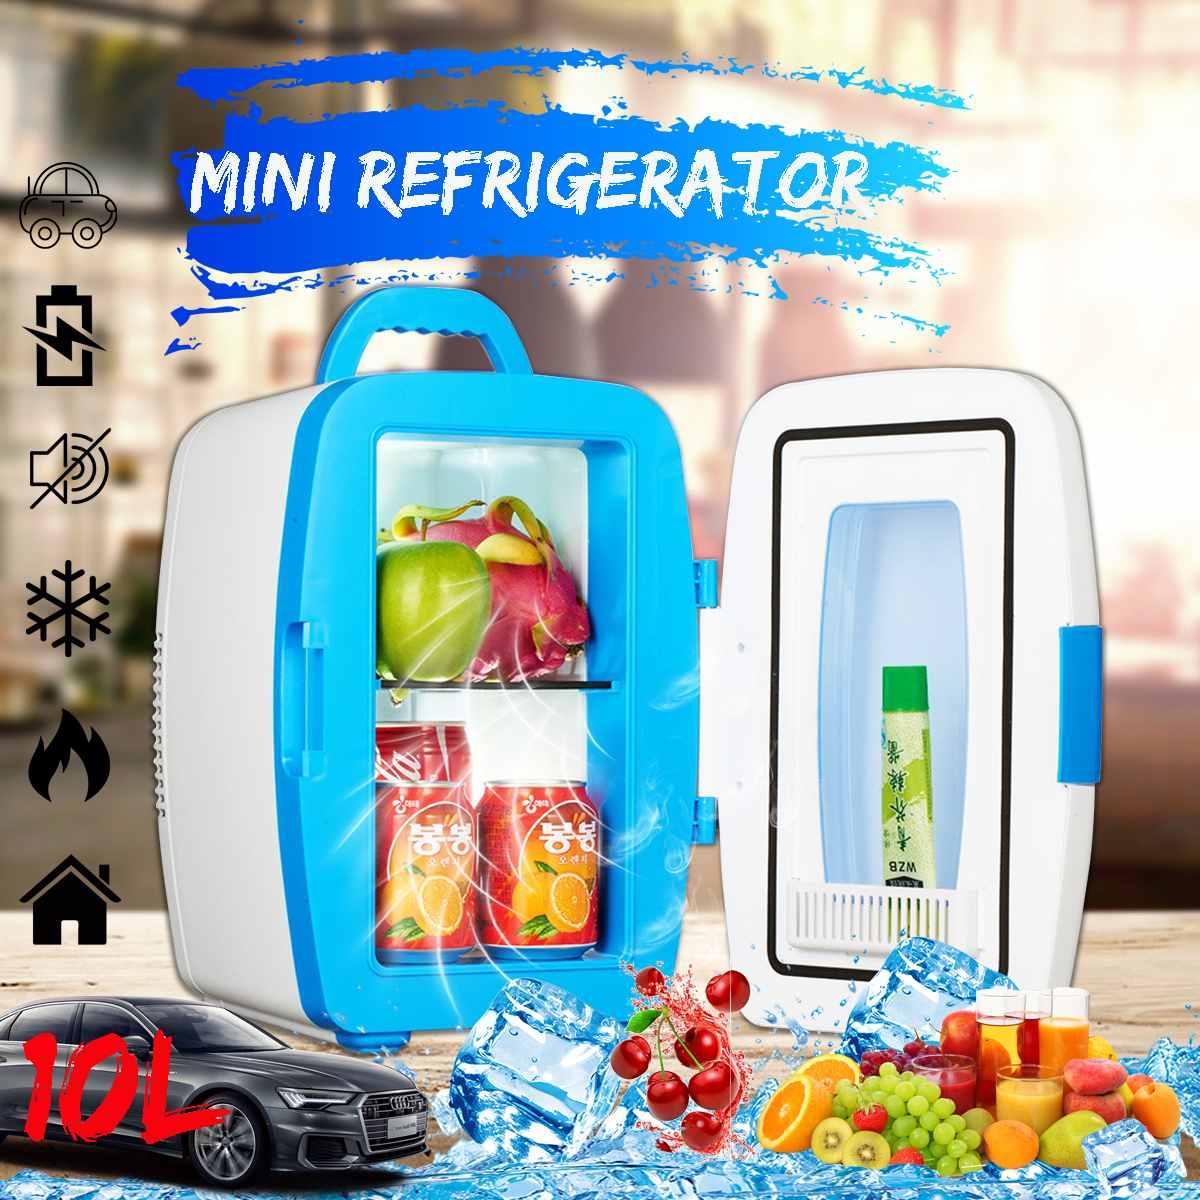 10L Refrigerator Freezer Cooler Warmer Home AC 220V DC 12V